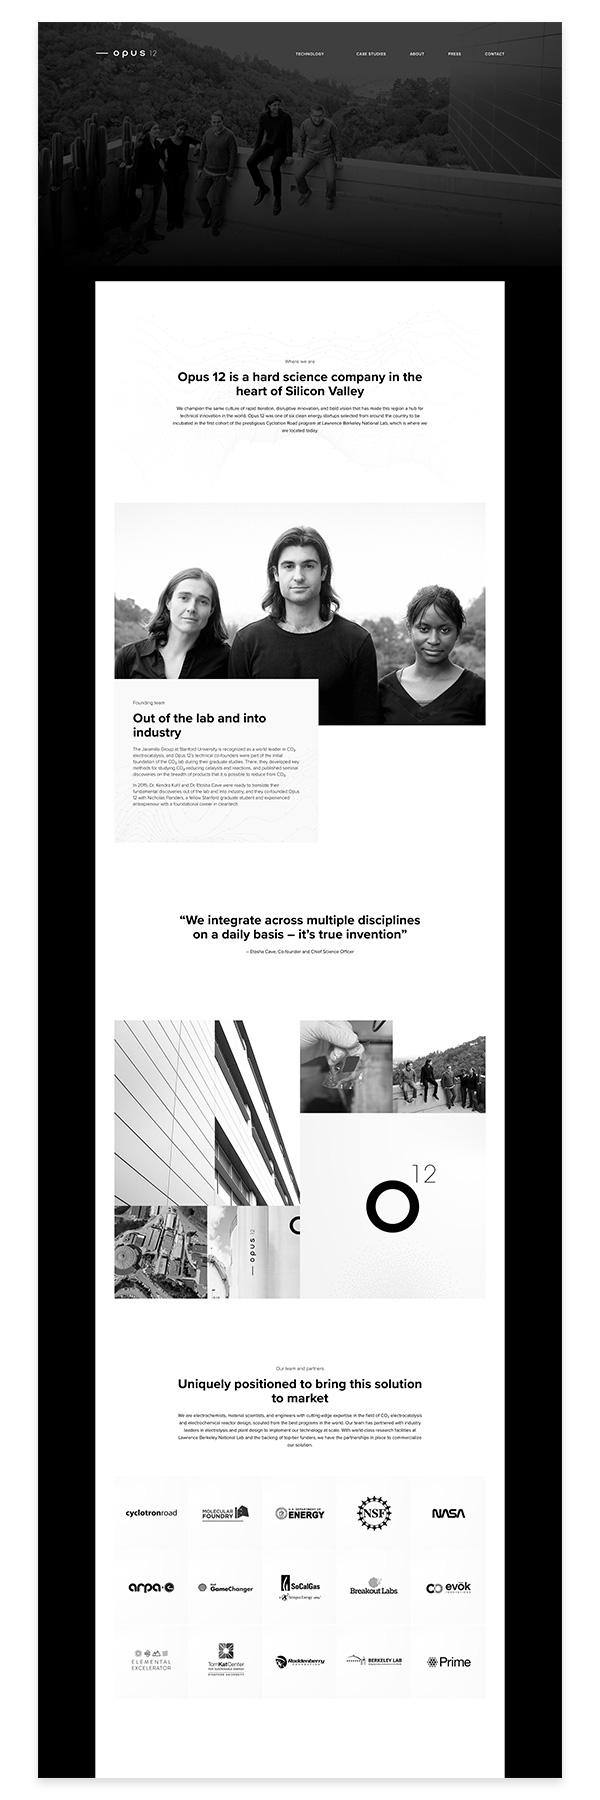 opus12-marketing-website-2.jpg